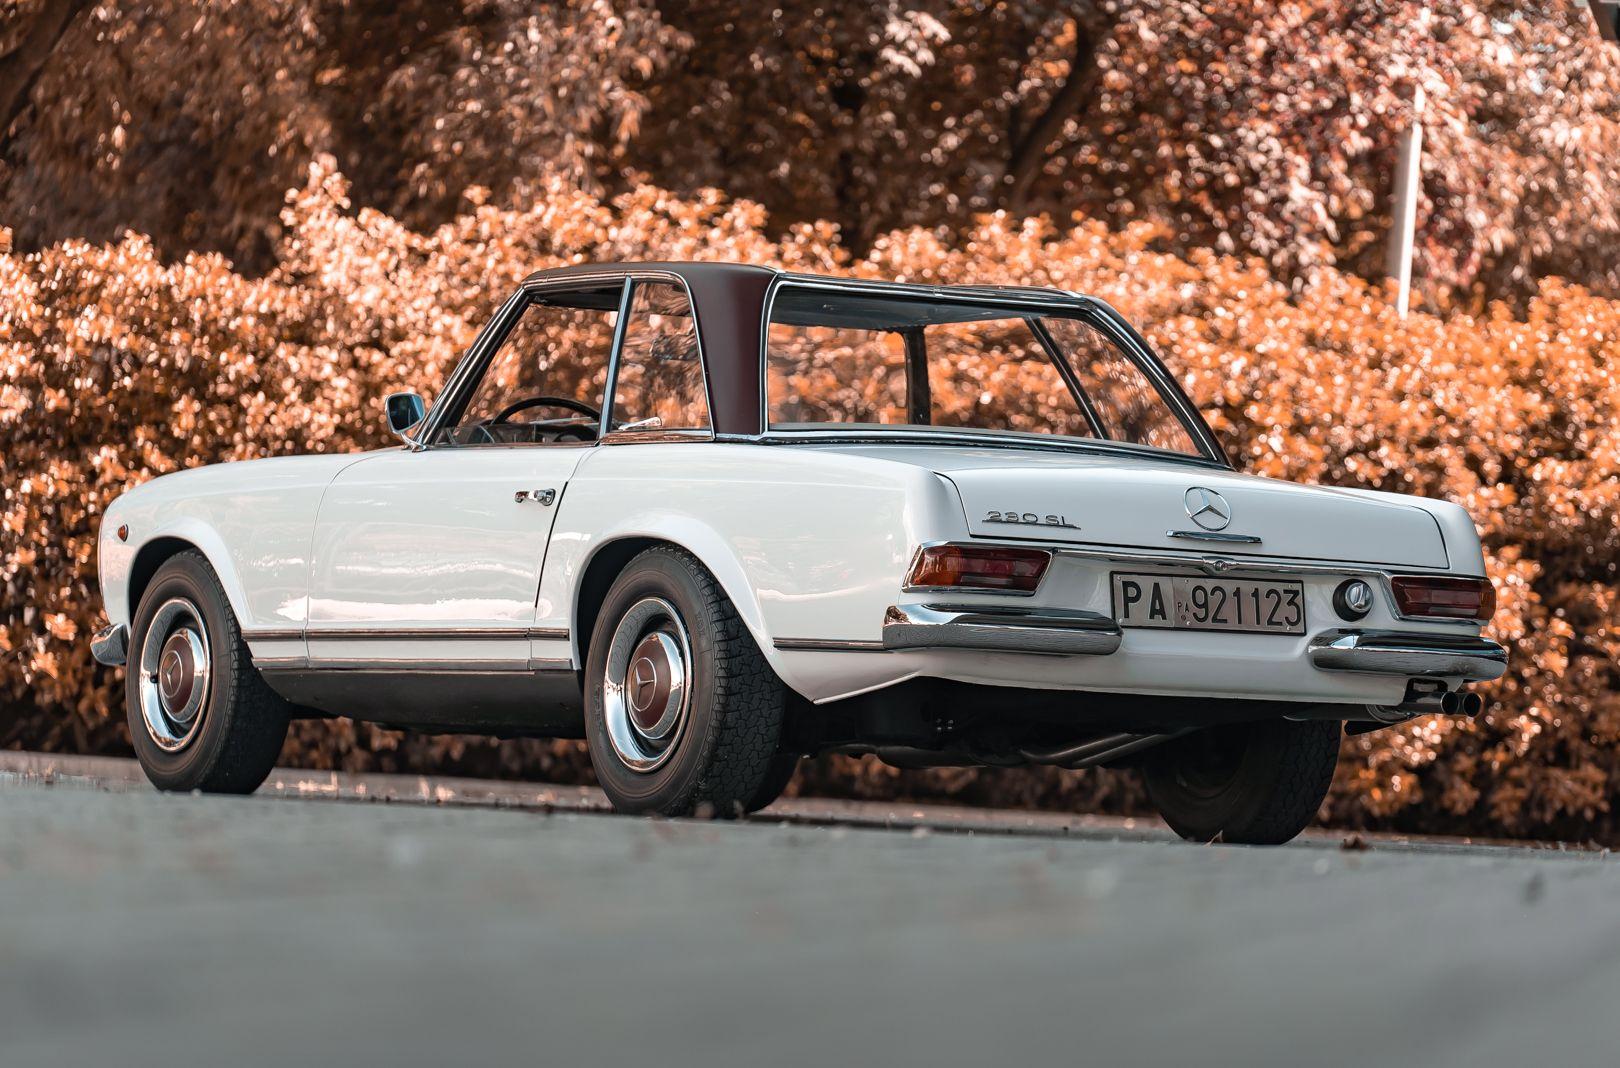 1966 Mercedes Benz SL230 Pagoda 76021